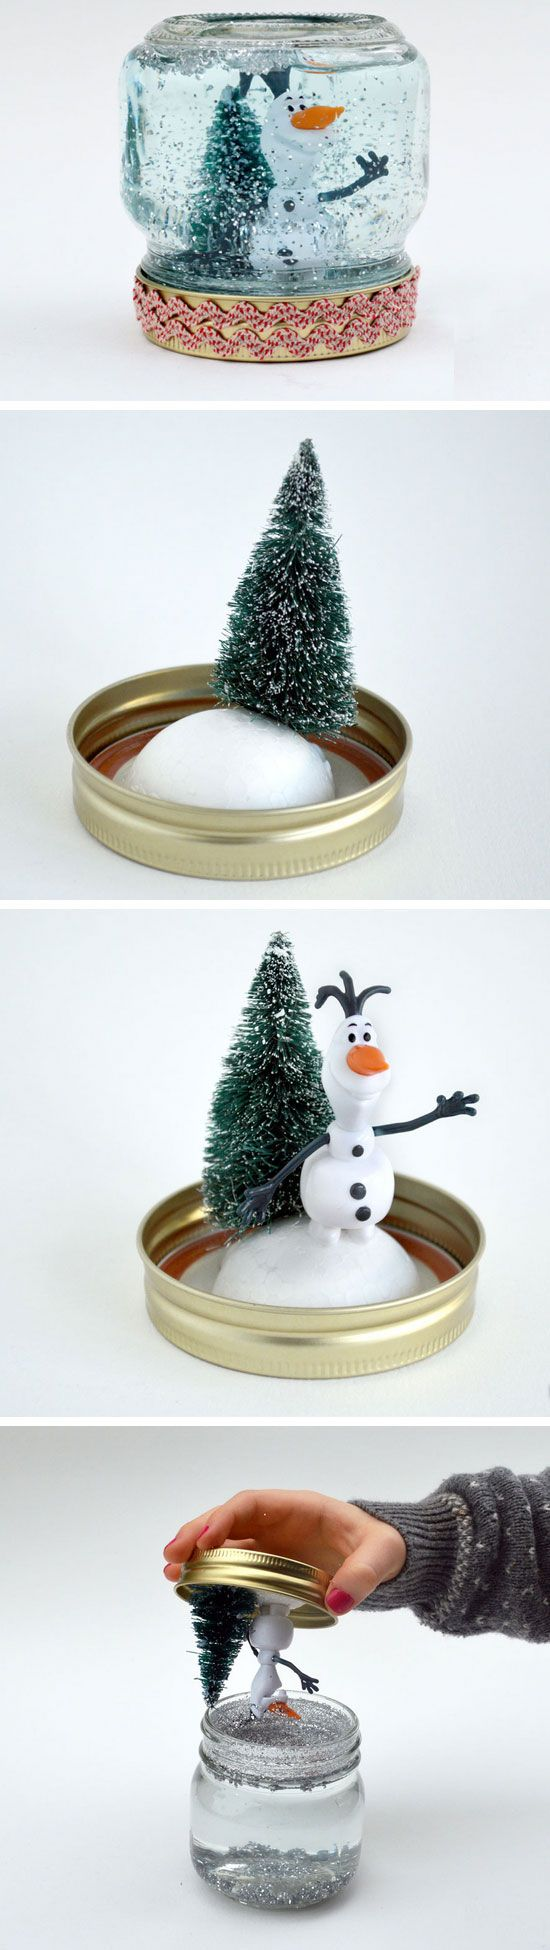 Christmas Craft Ideas For Boys Part - 25: 20 Easy Christmas Decor Ideas For Kids To Make | DIY Christmas, Christmas  Décor And Easy